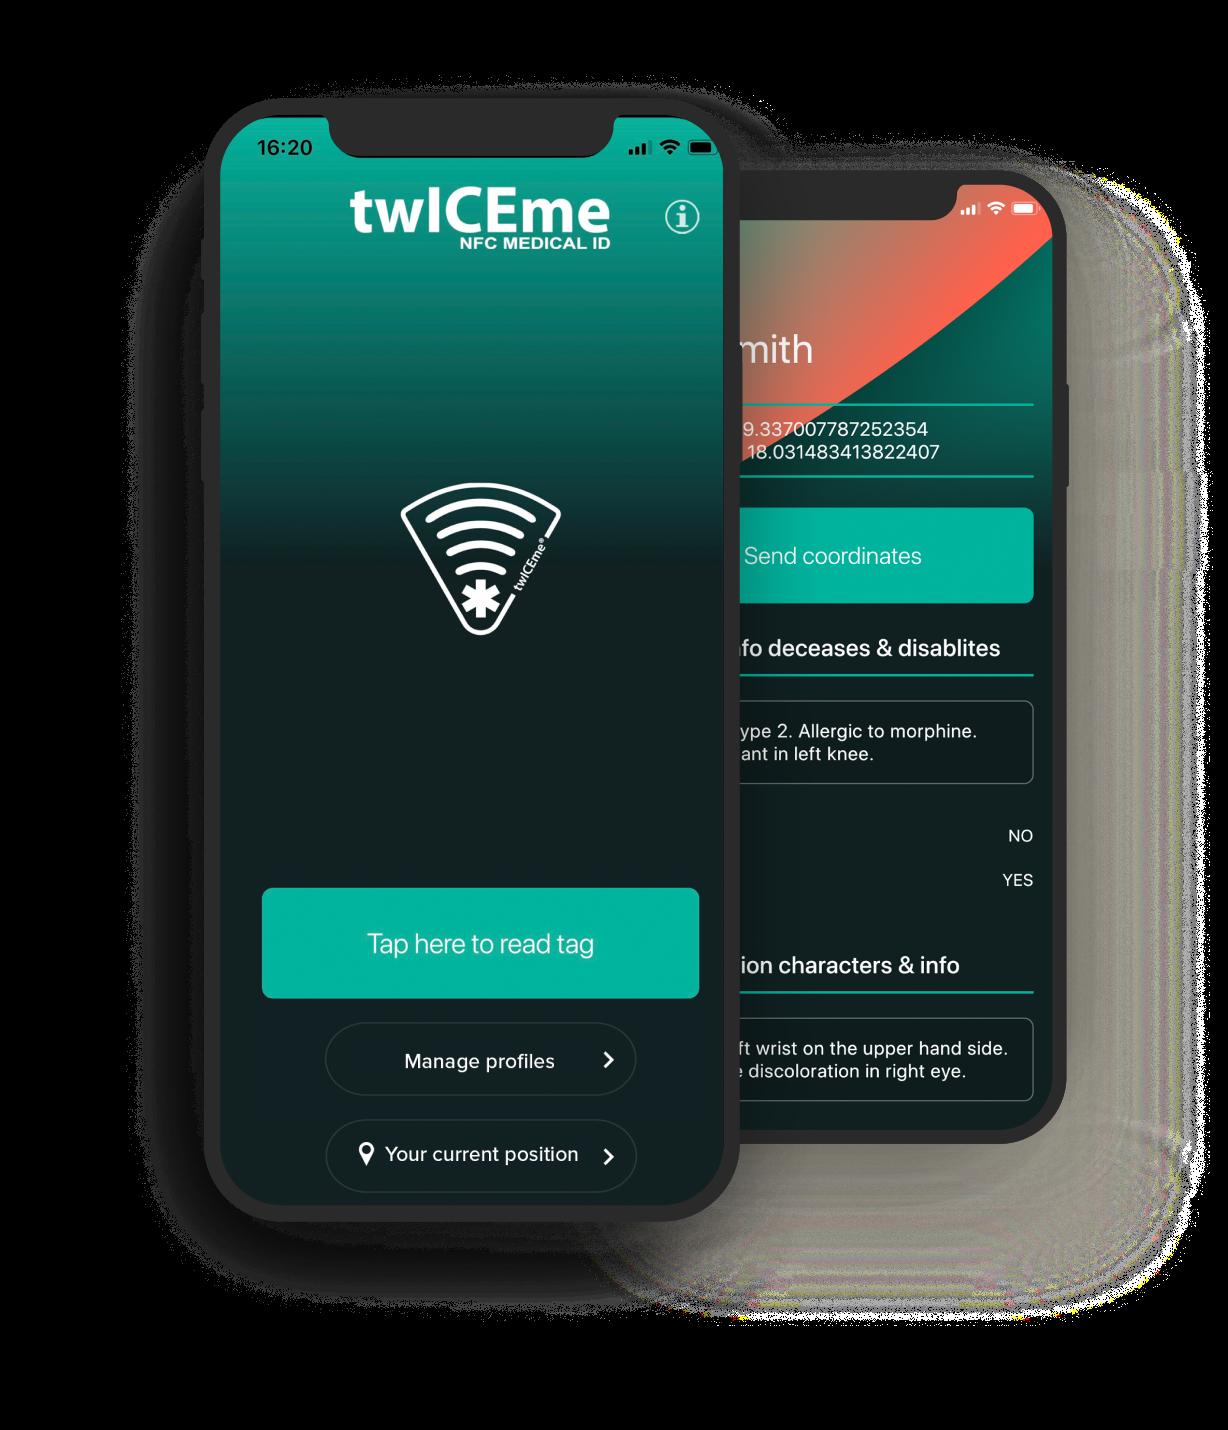 The twICEme app